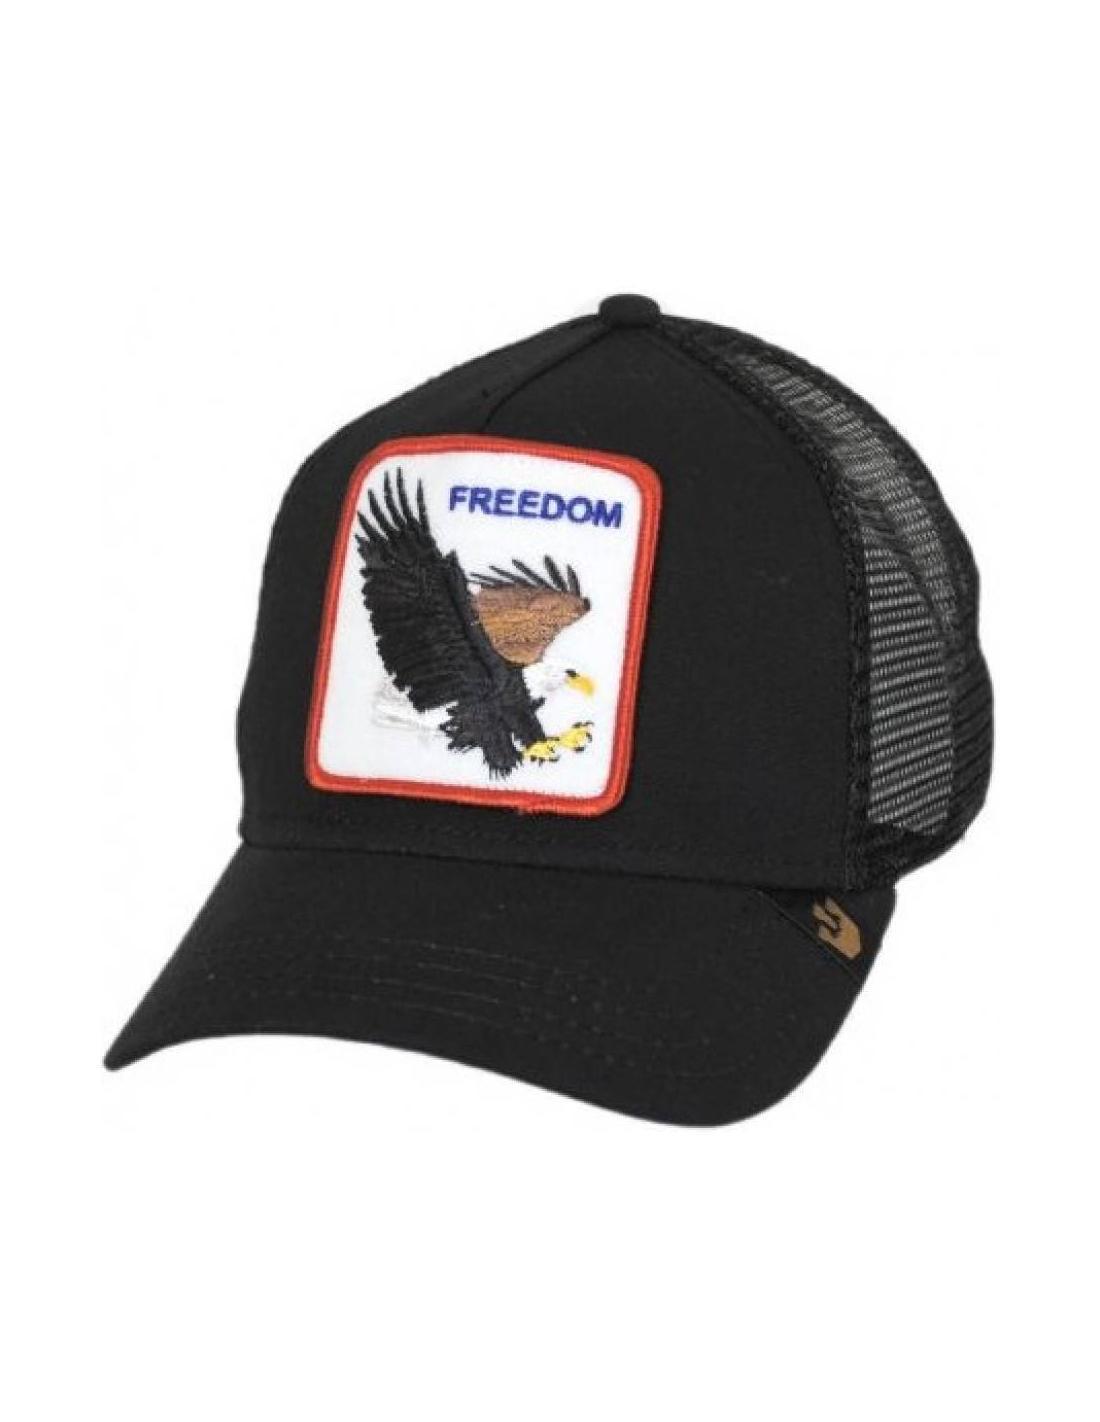 c3358e85edcb6 Gorra Goorin Freedom Black Animal Farm Trucker Hat